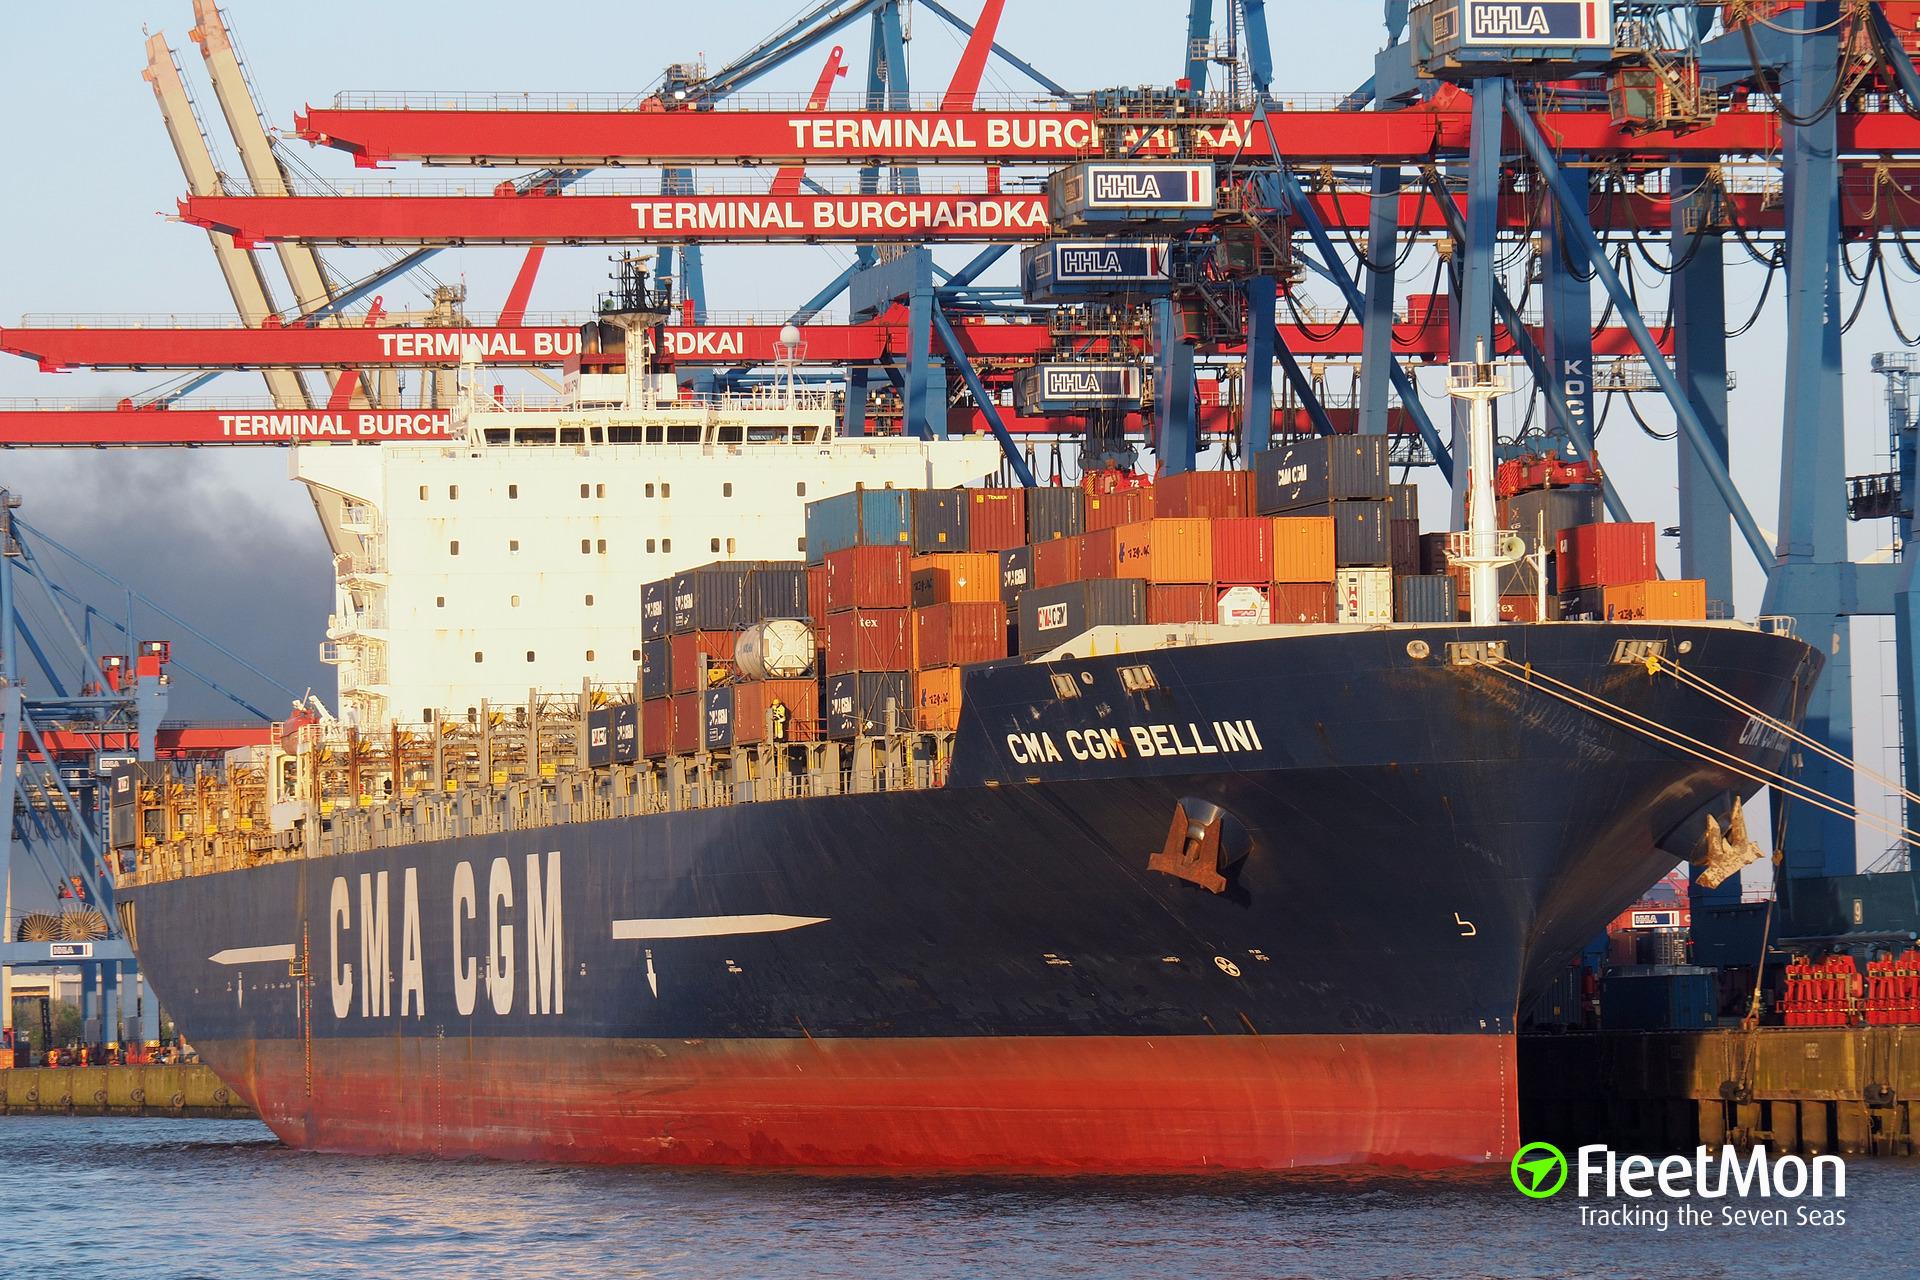   CMA CGM BELLINI breached by pilot boat, oil leak, Hamburg